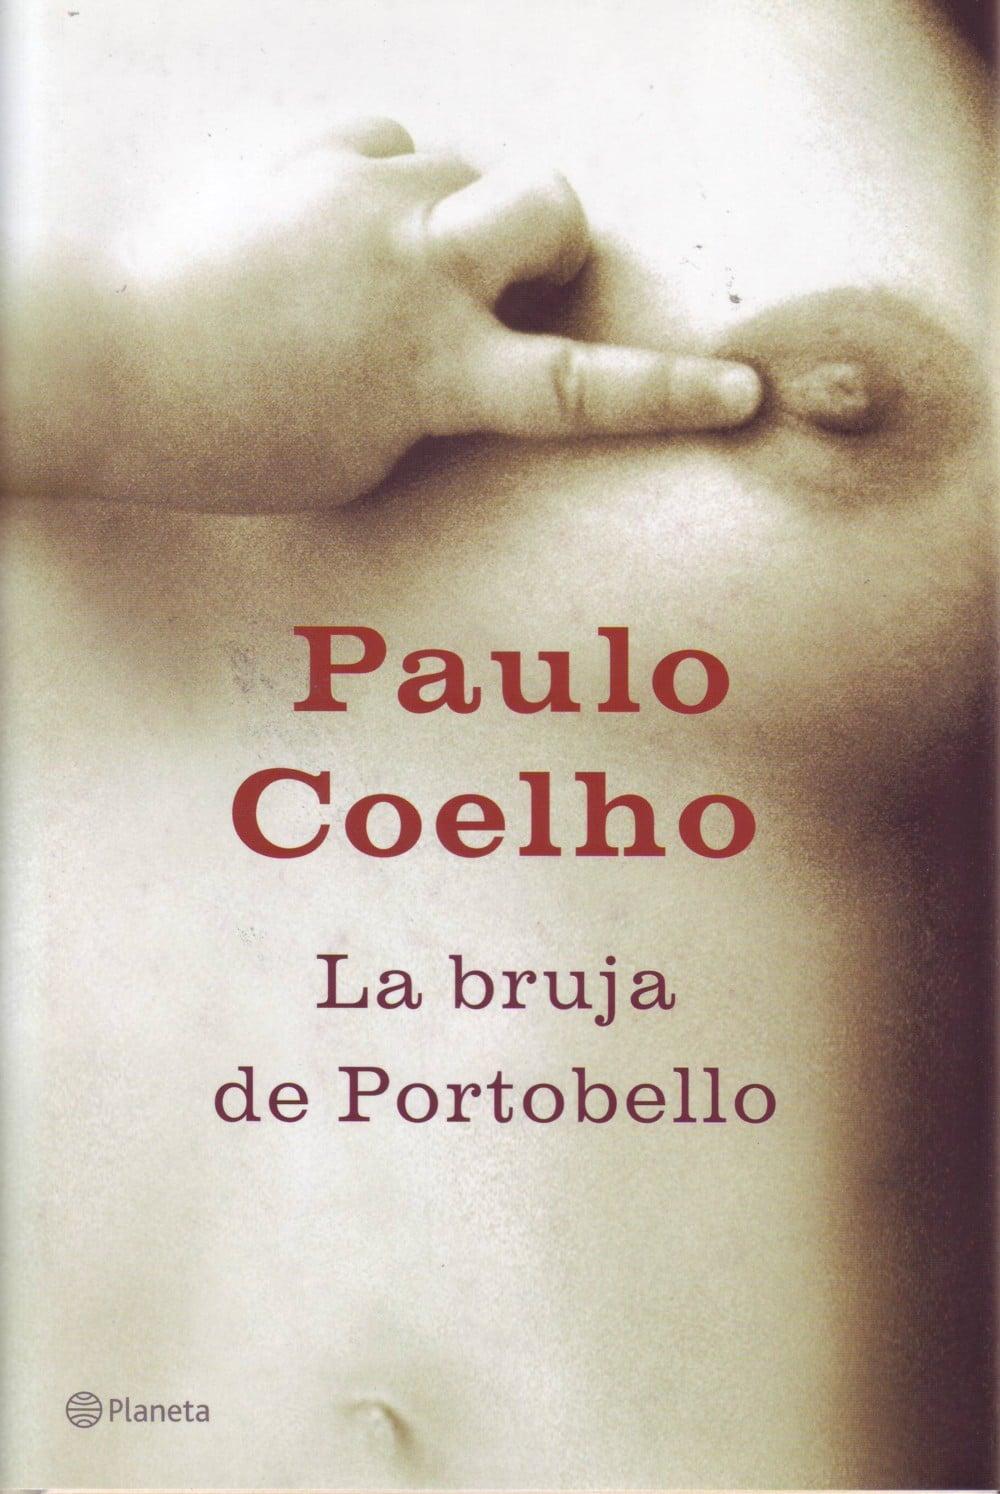 Descargar el libro La bruja de Portobello (PDF - ePUB)